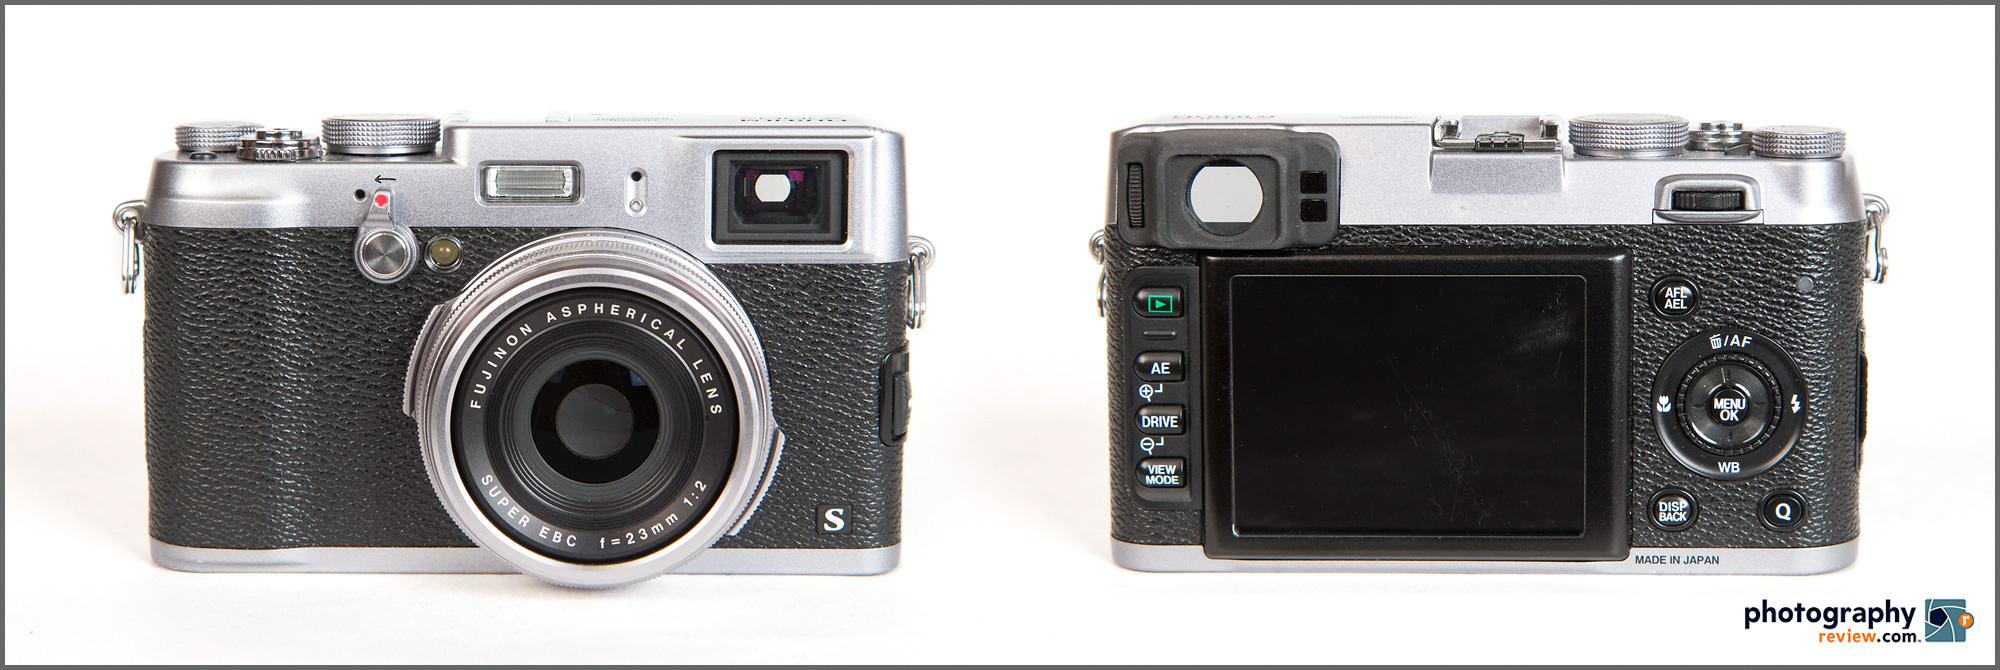 Fujifilm X100S - Front & Back Views